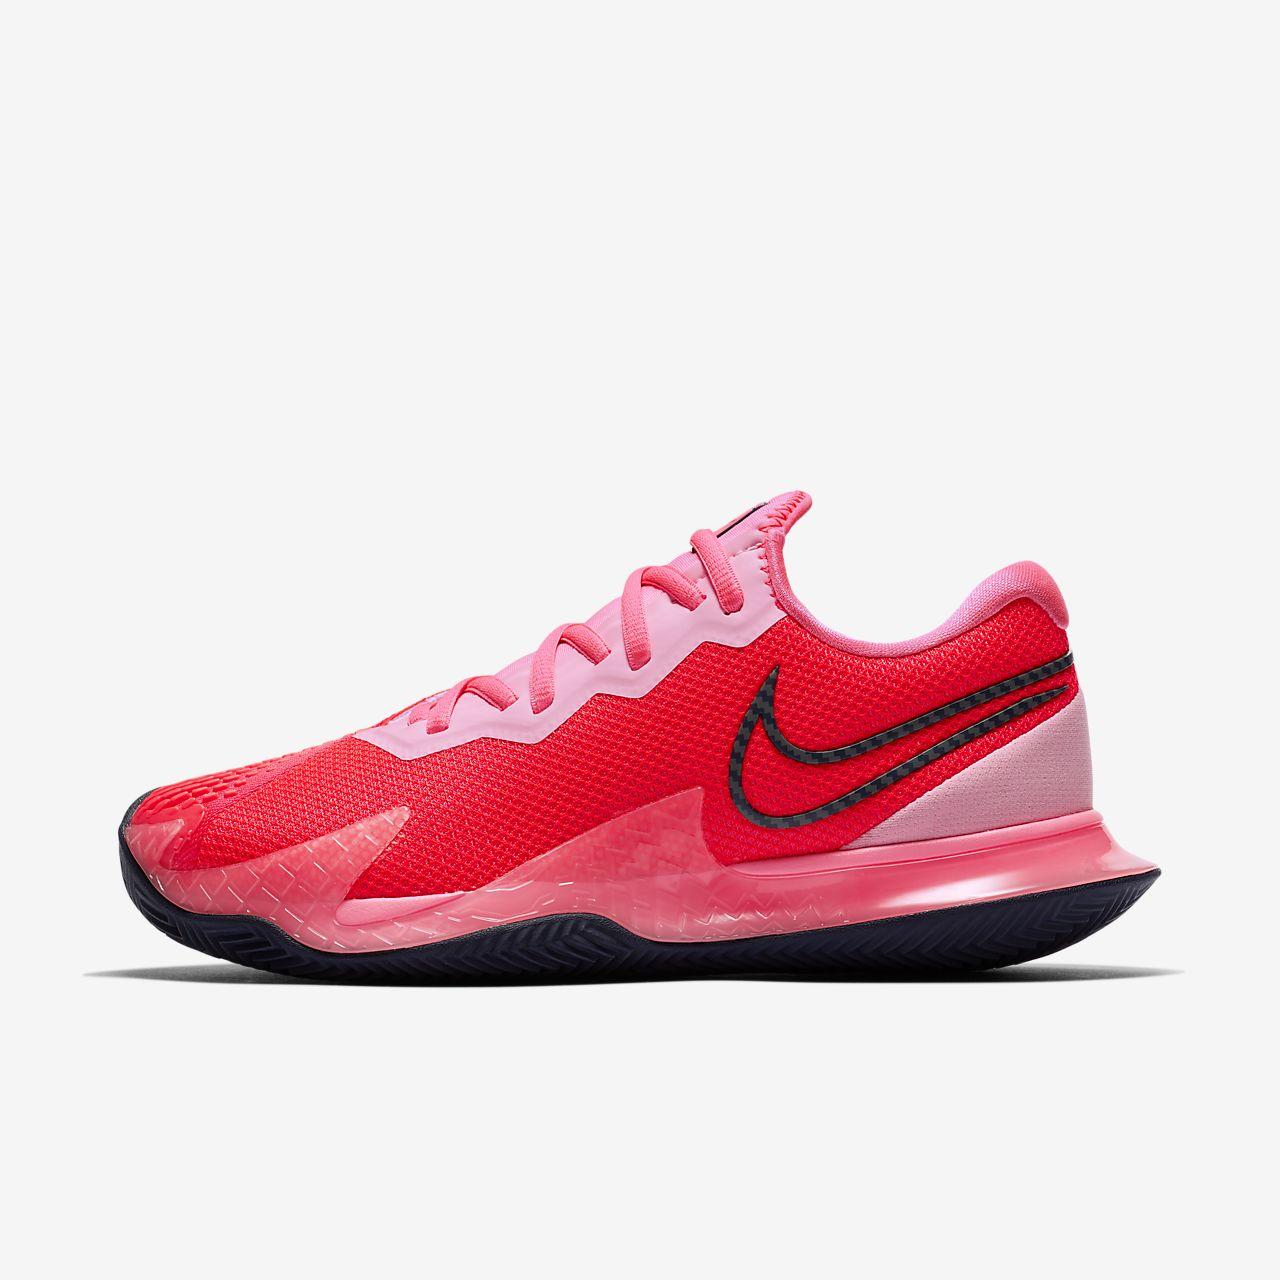 chaussures tennis femme terre battue nike